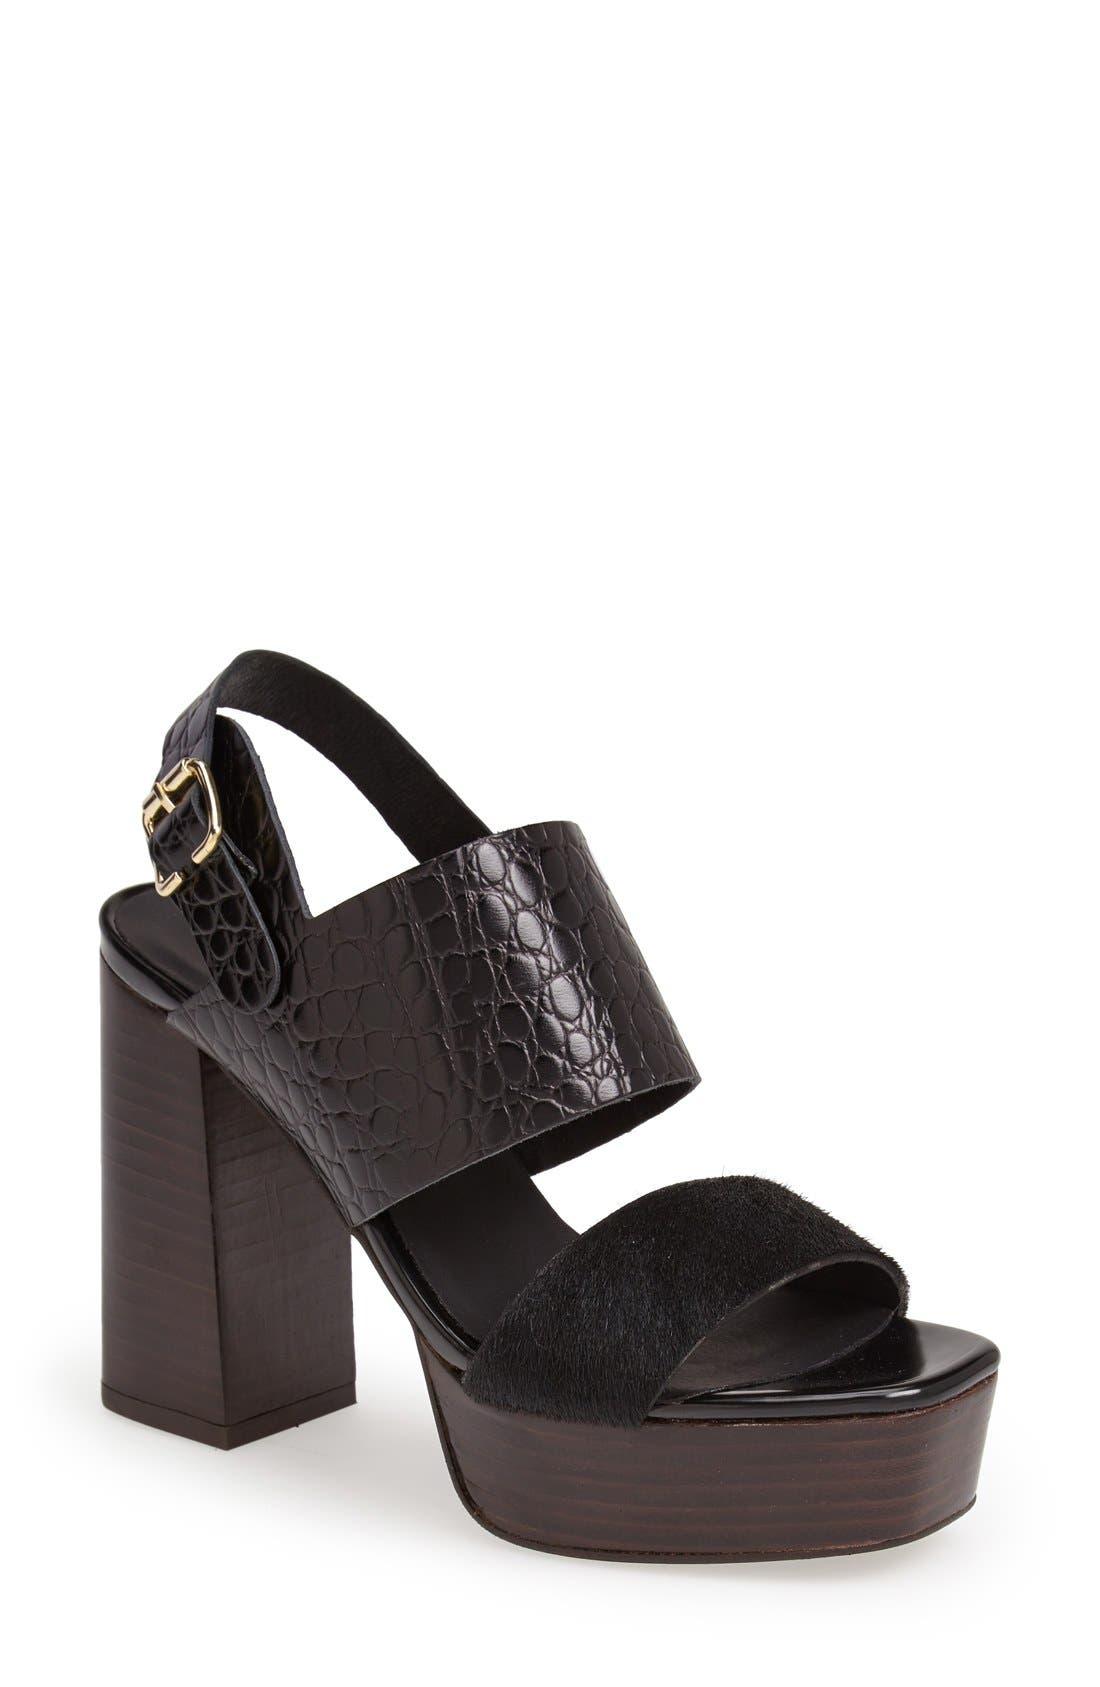 Main Image - Topshop 'Lime' Platform Sandal (Women)